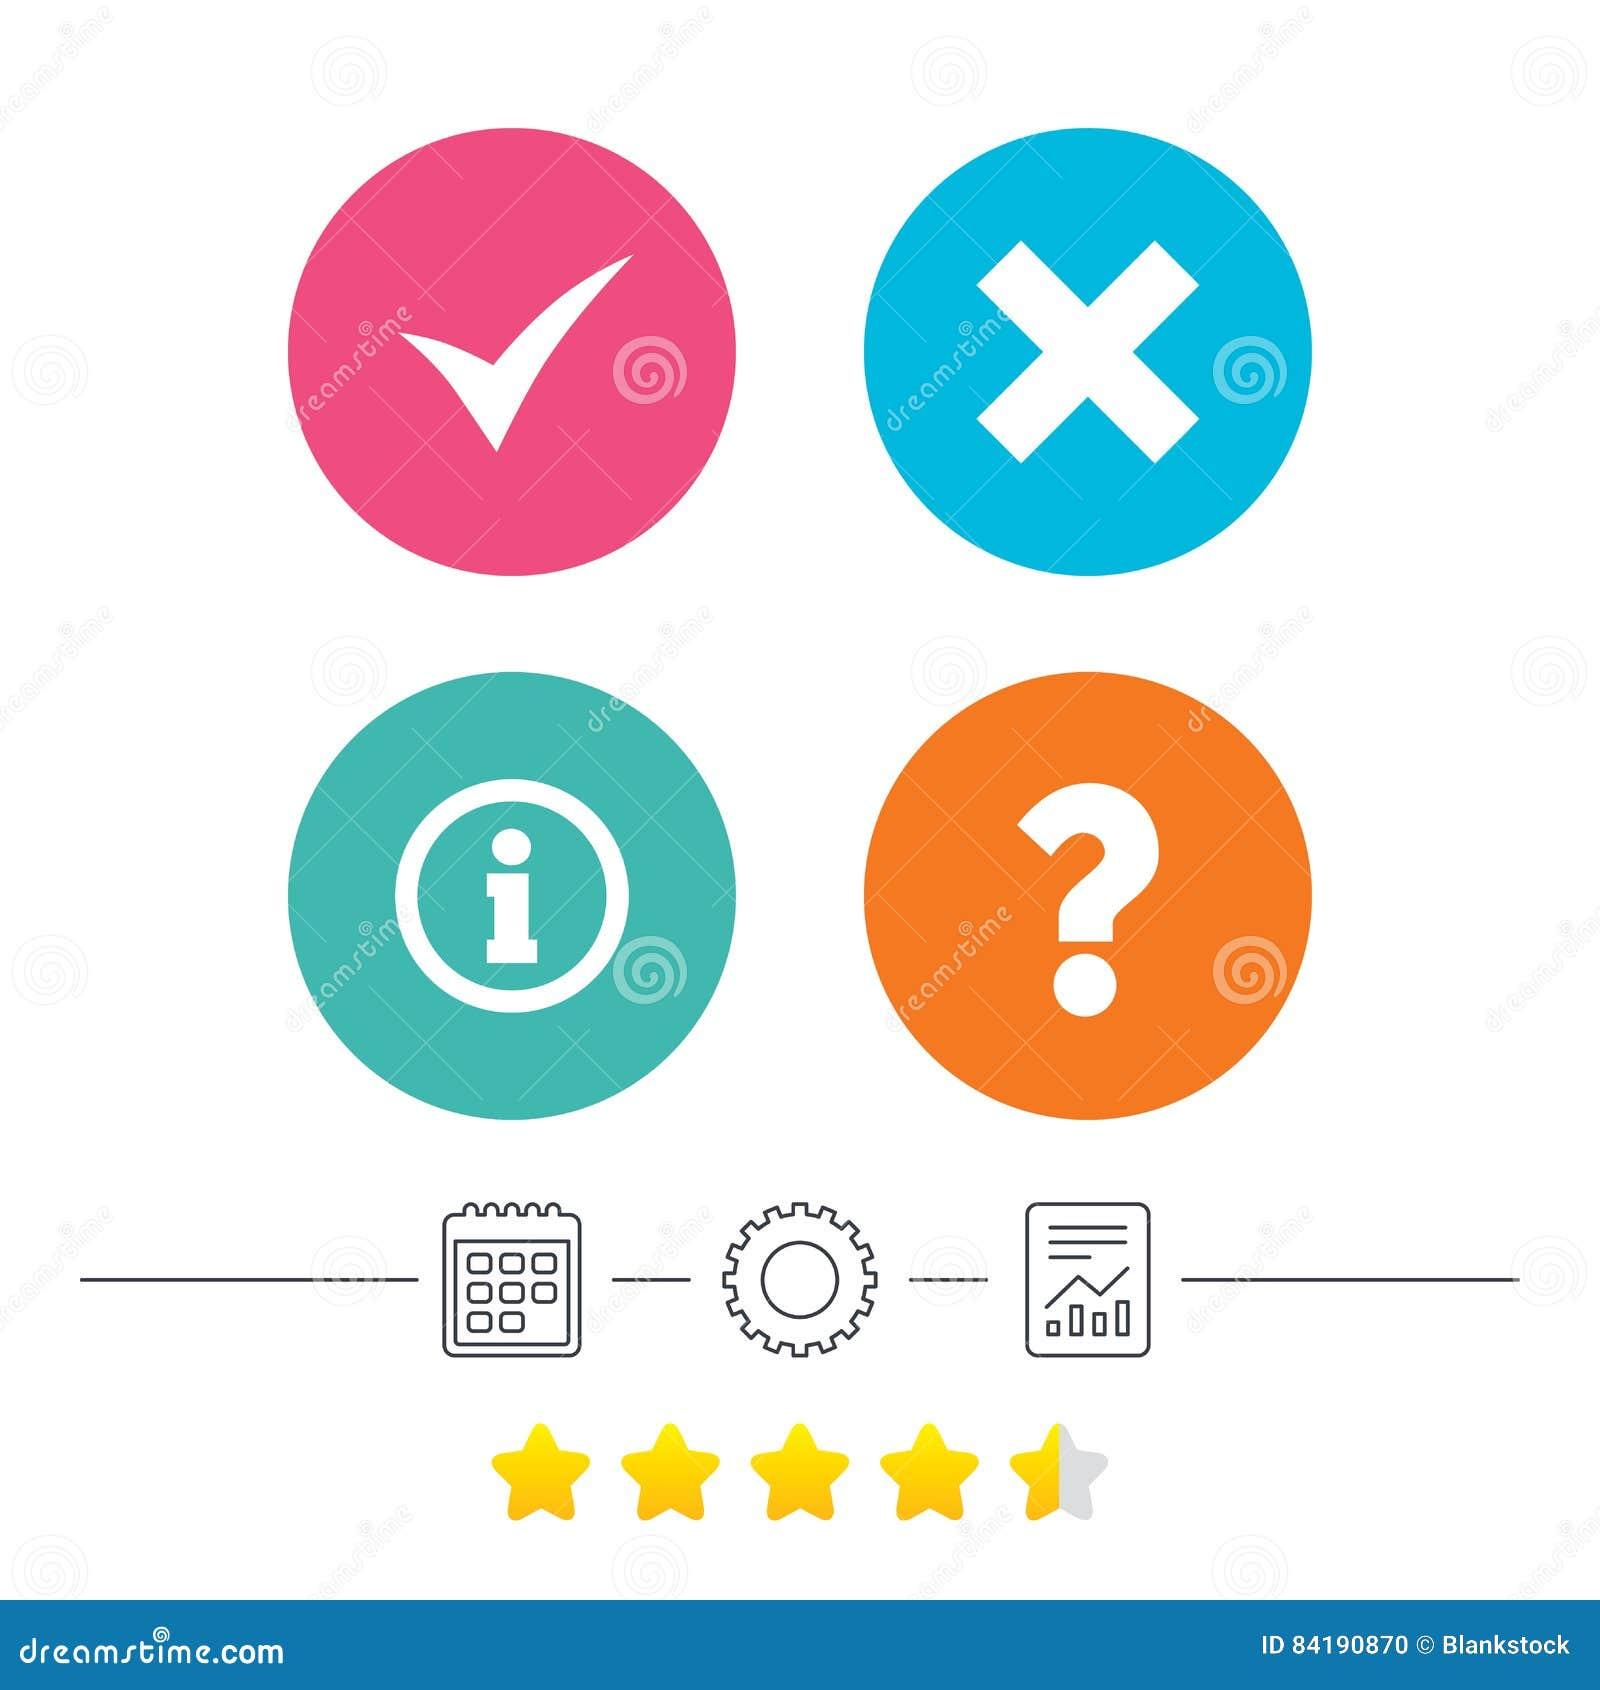 Calendar Illustration Questions : Information icons question faq symbol stock vector